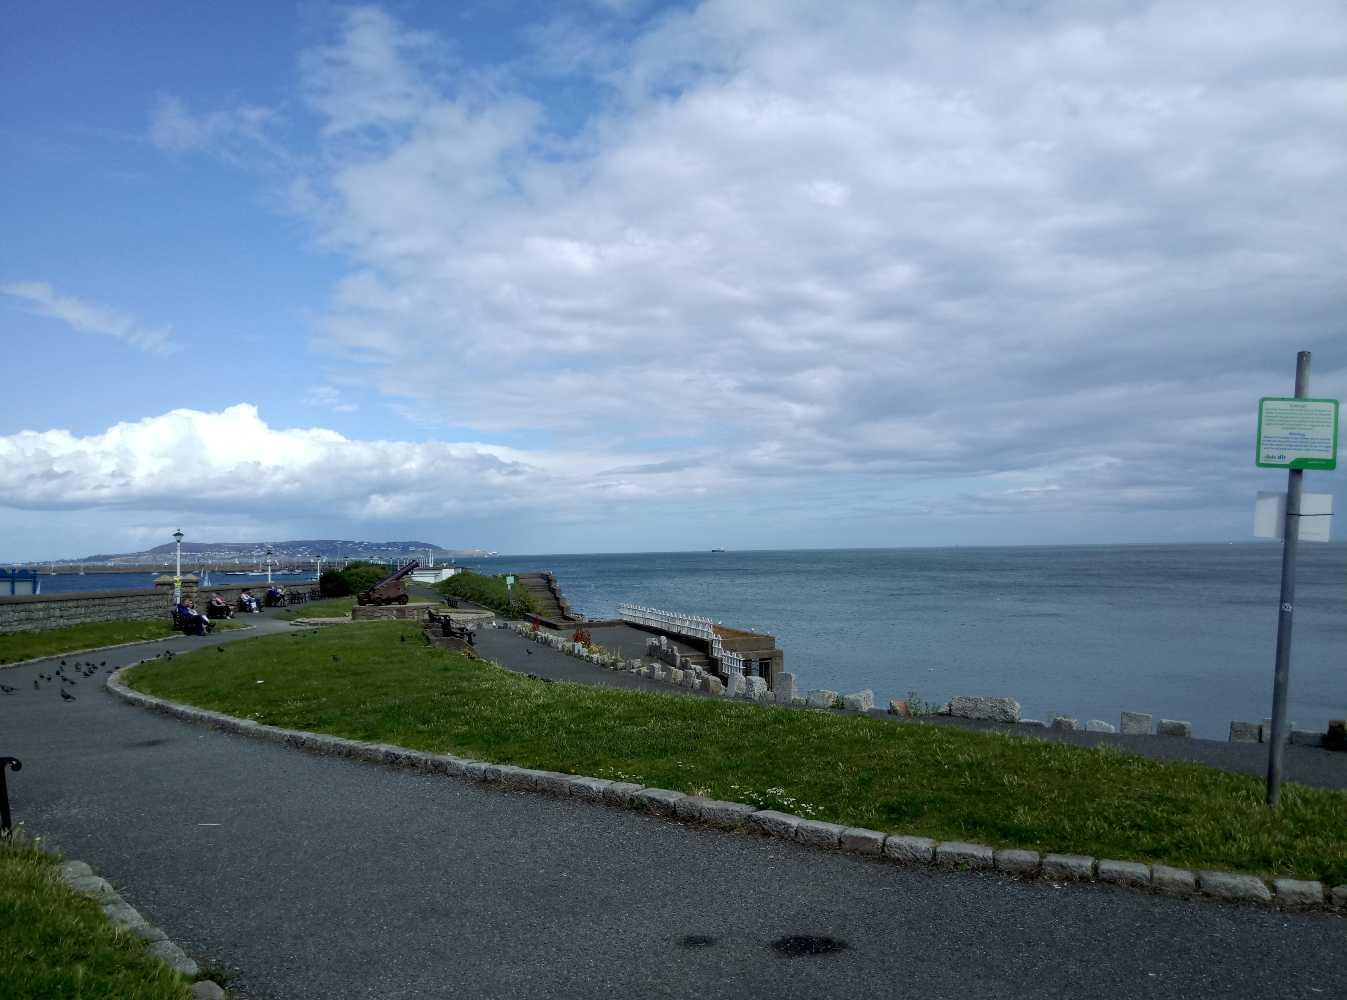 August 2019 - Dún Laoghaire, Ireland (Part 5)